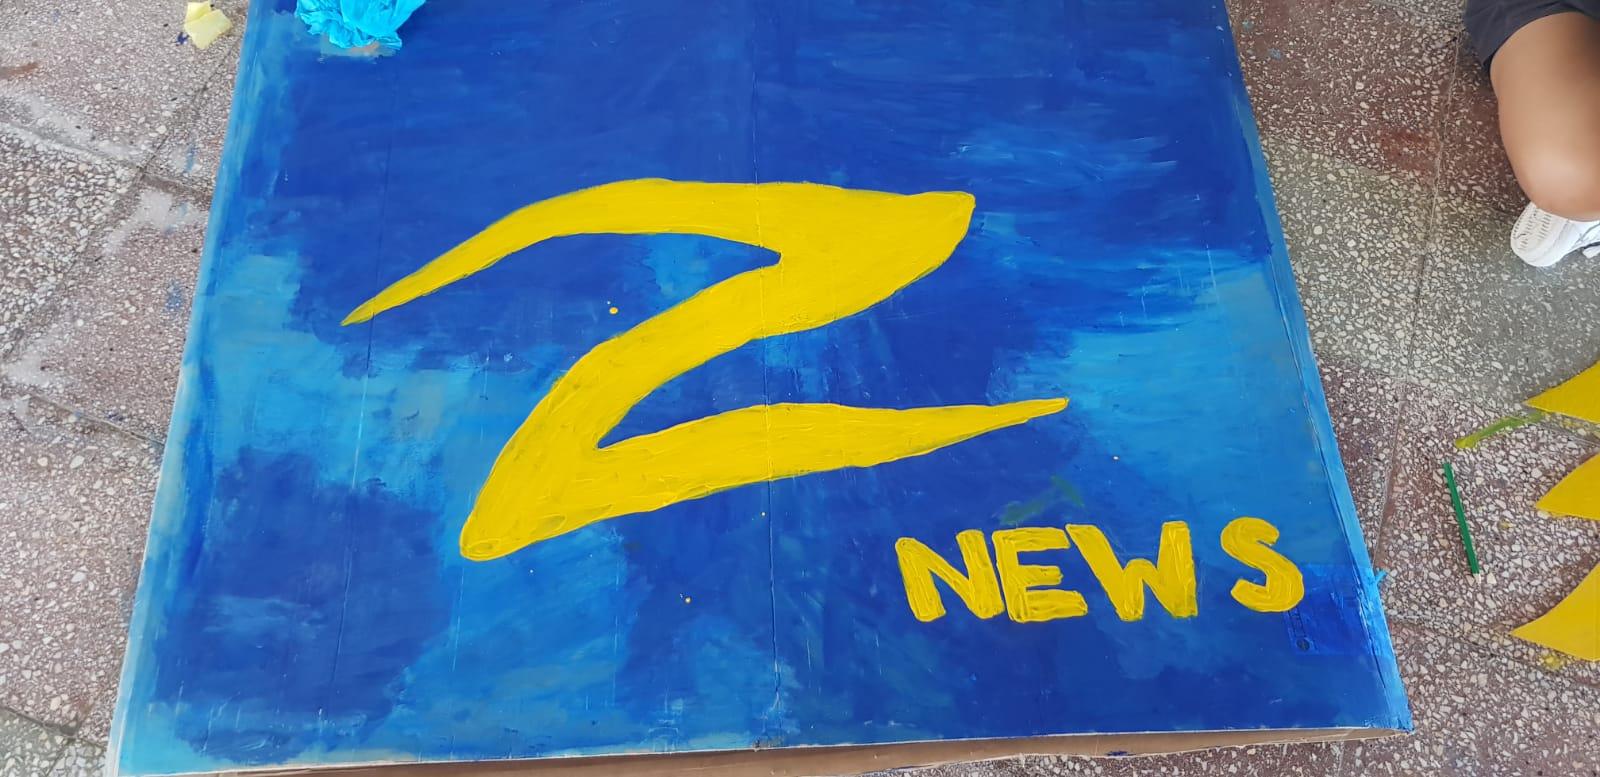 Z кемп, ден 20 - Изкуство и занаяти - лого на Z news